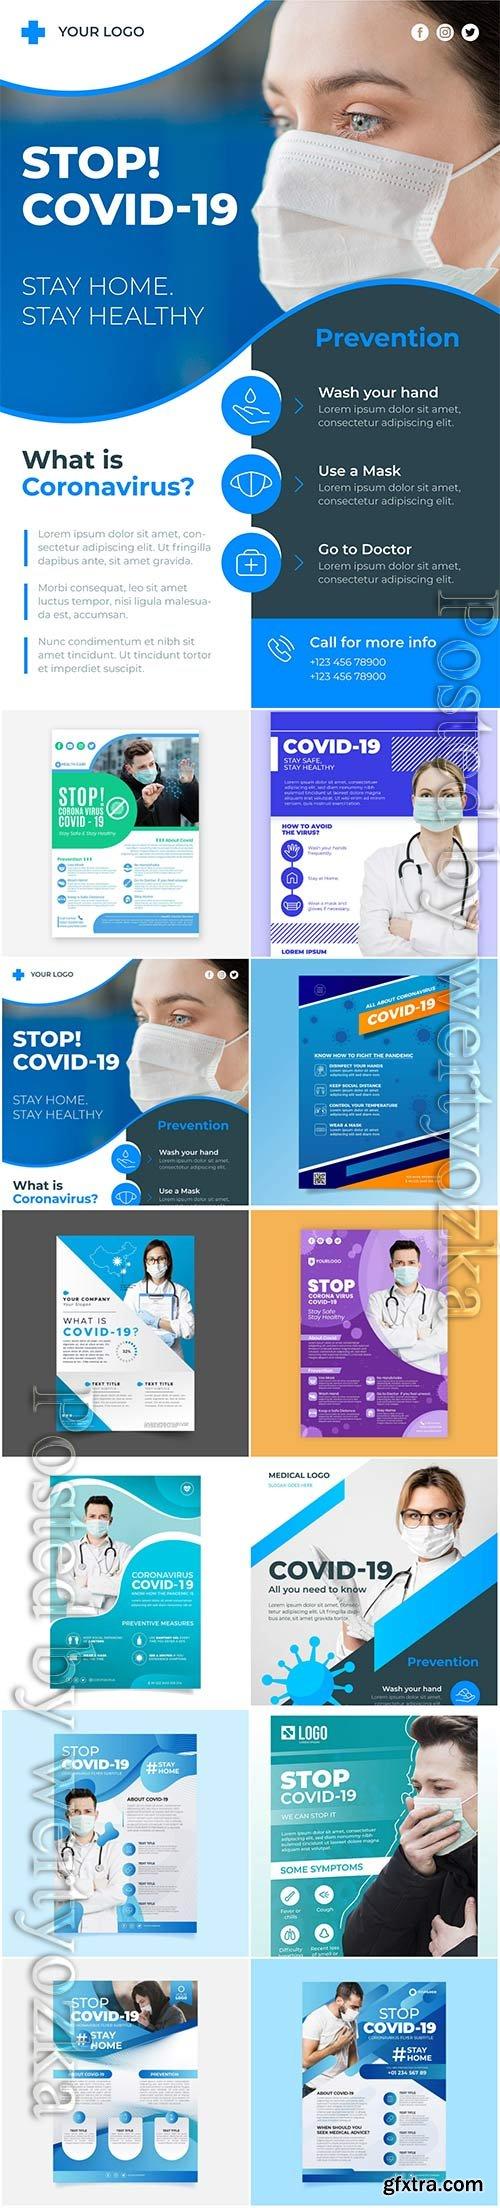 Realistic coronavirus vector background, stop covid-19 vol 3